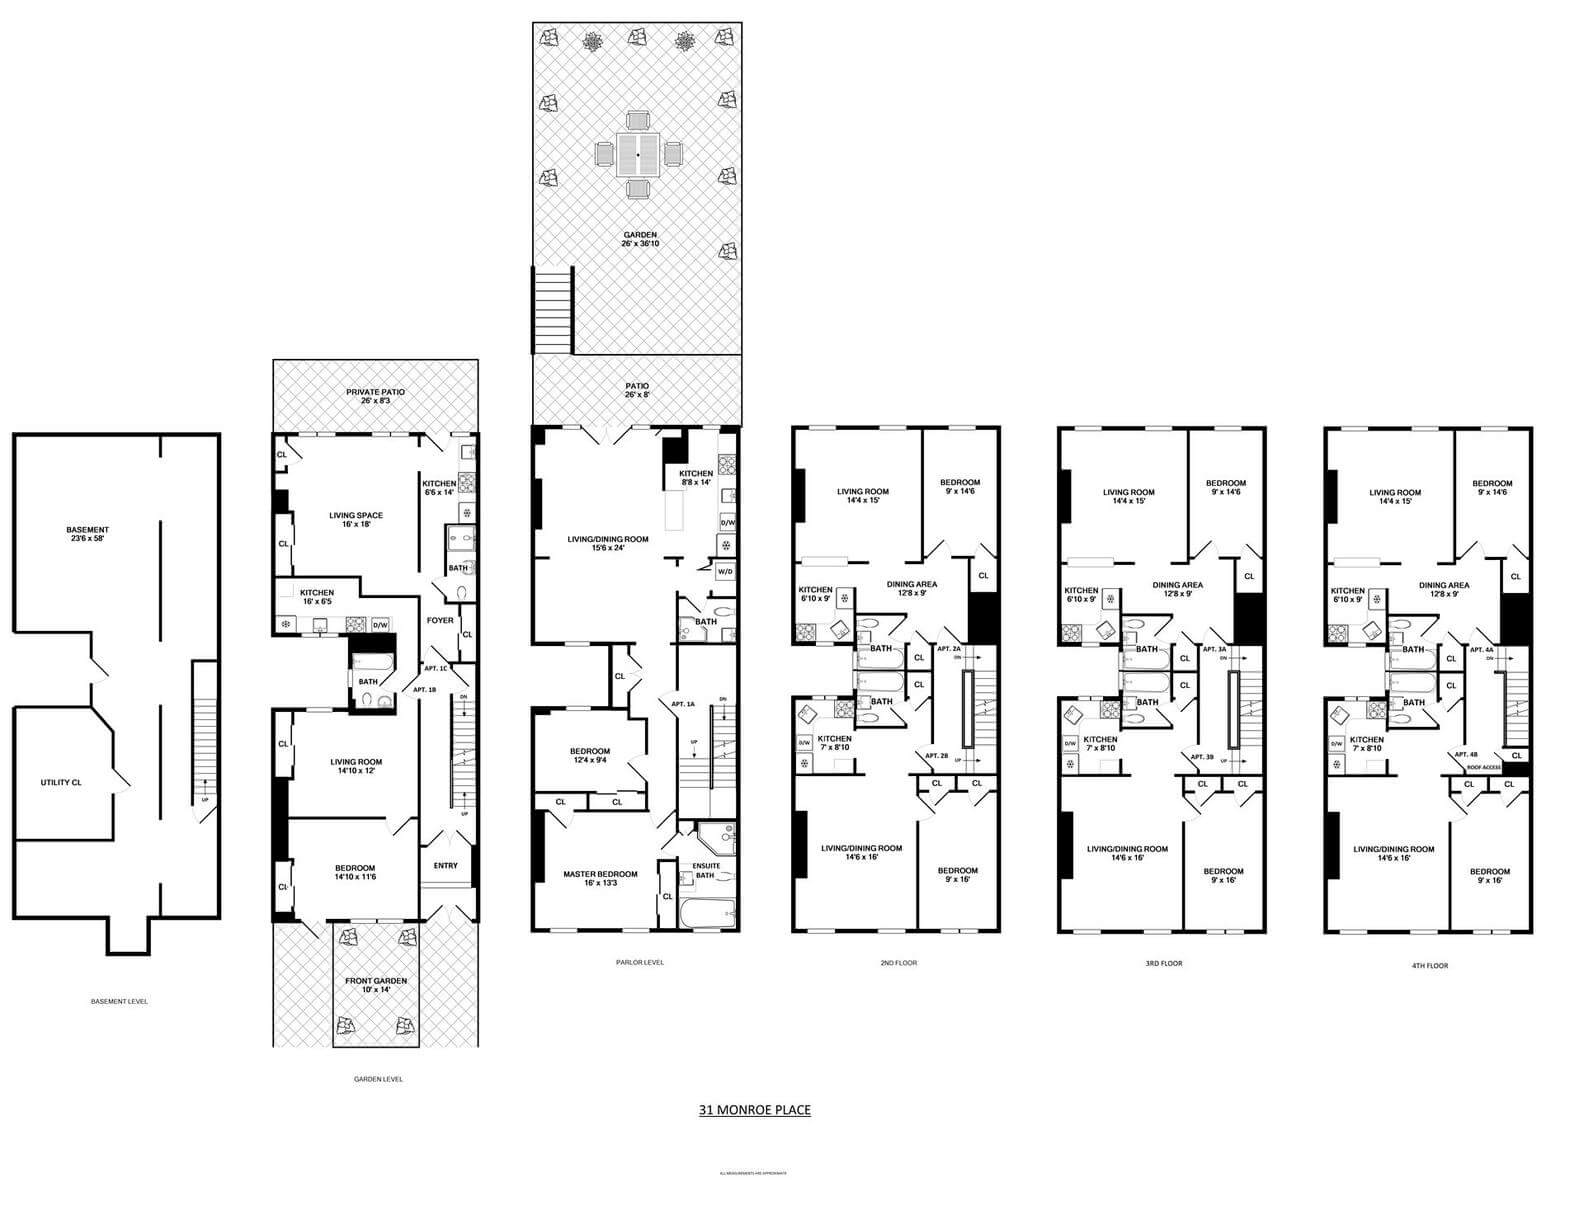 Brooklyn Homes For Sale 31 Monroe Place In Brooklyn